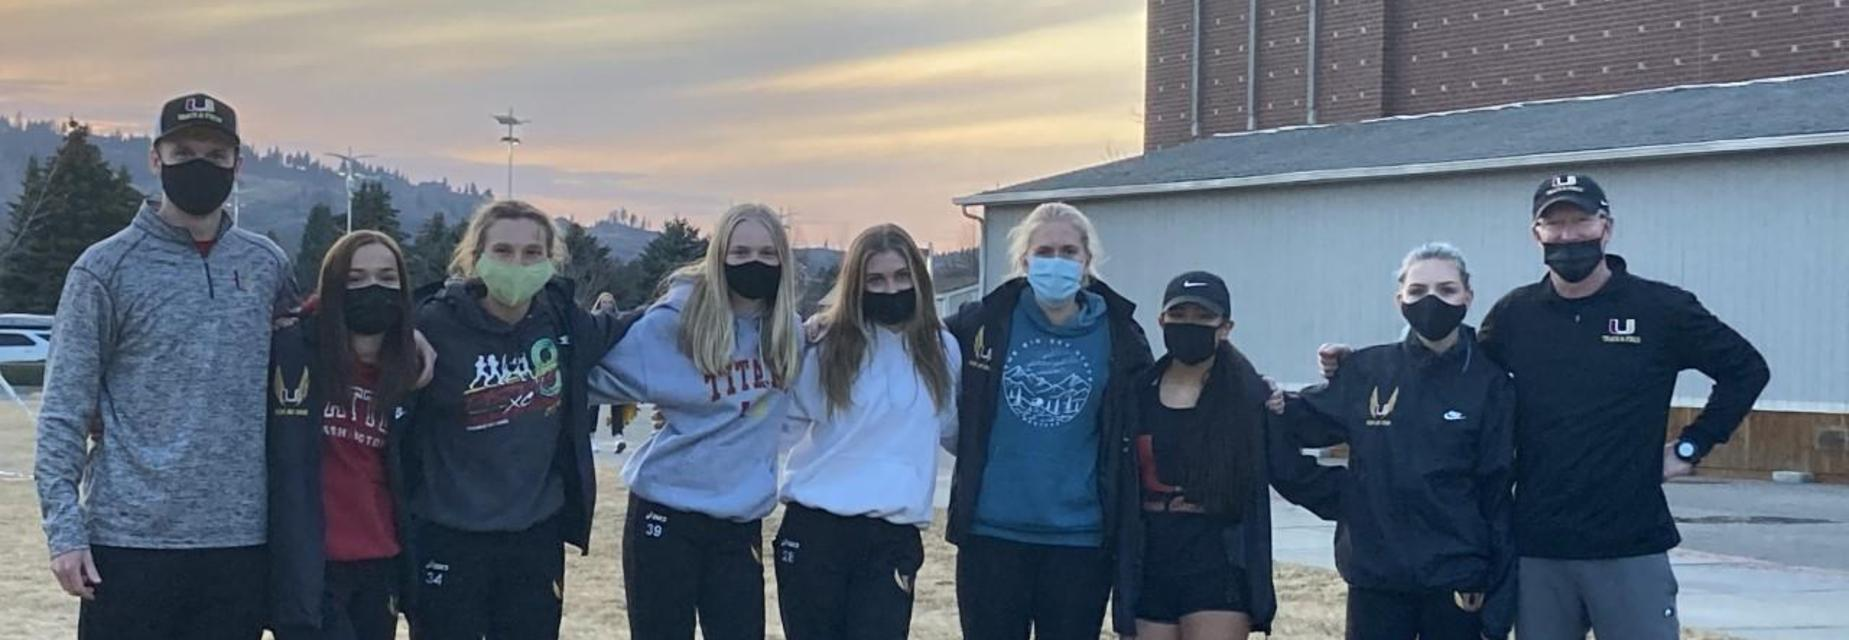 Girls cross country team photo